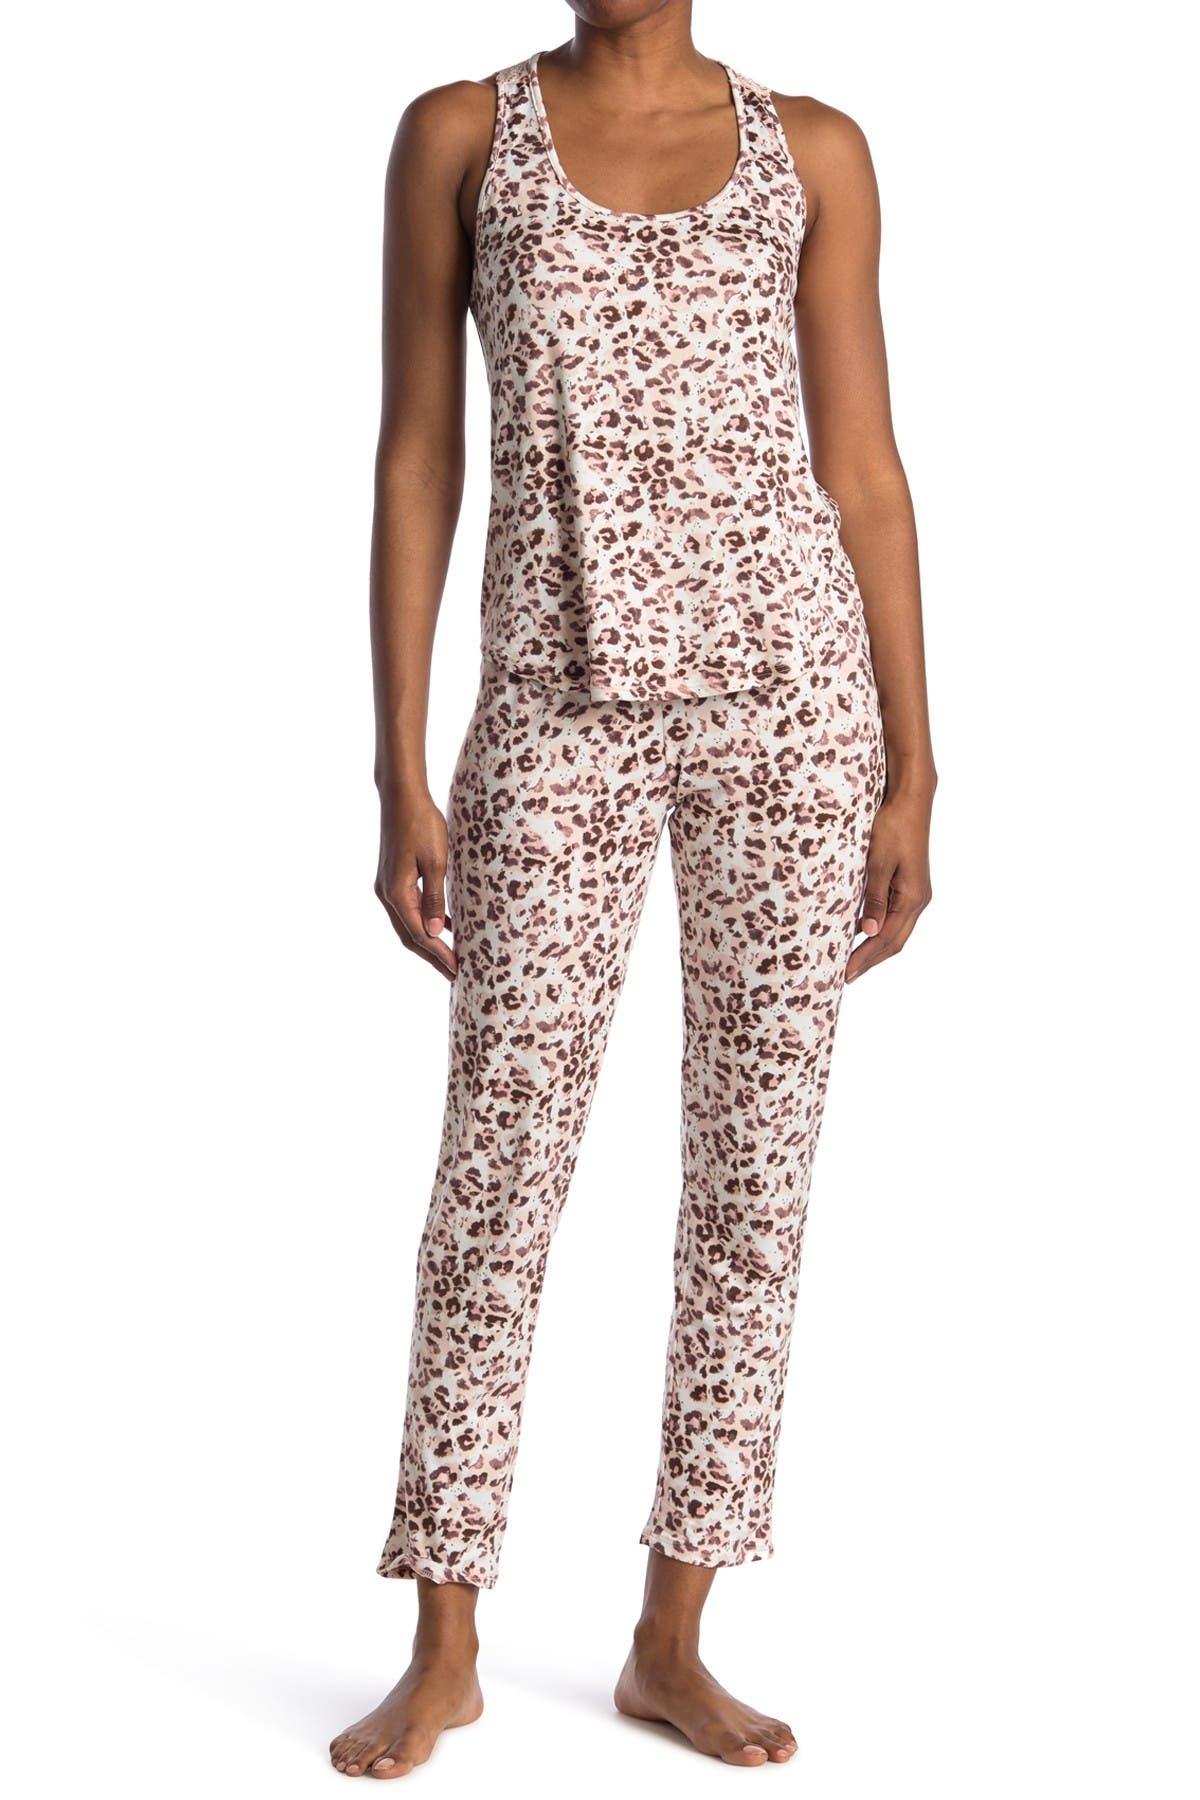 Image of Flora by Flora Nikrooz Tank & Pants 2-Piece Pajama Set